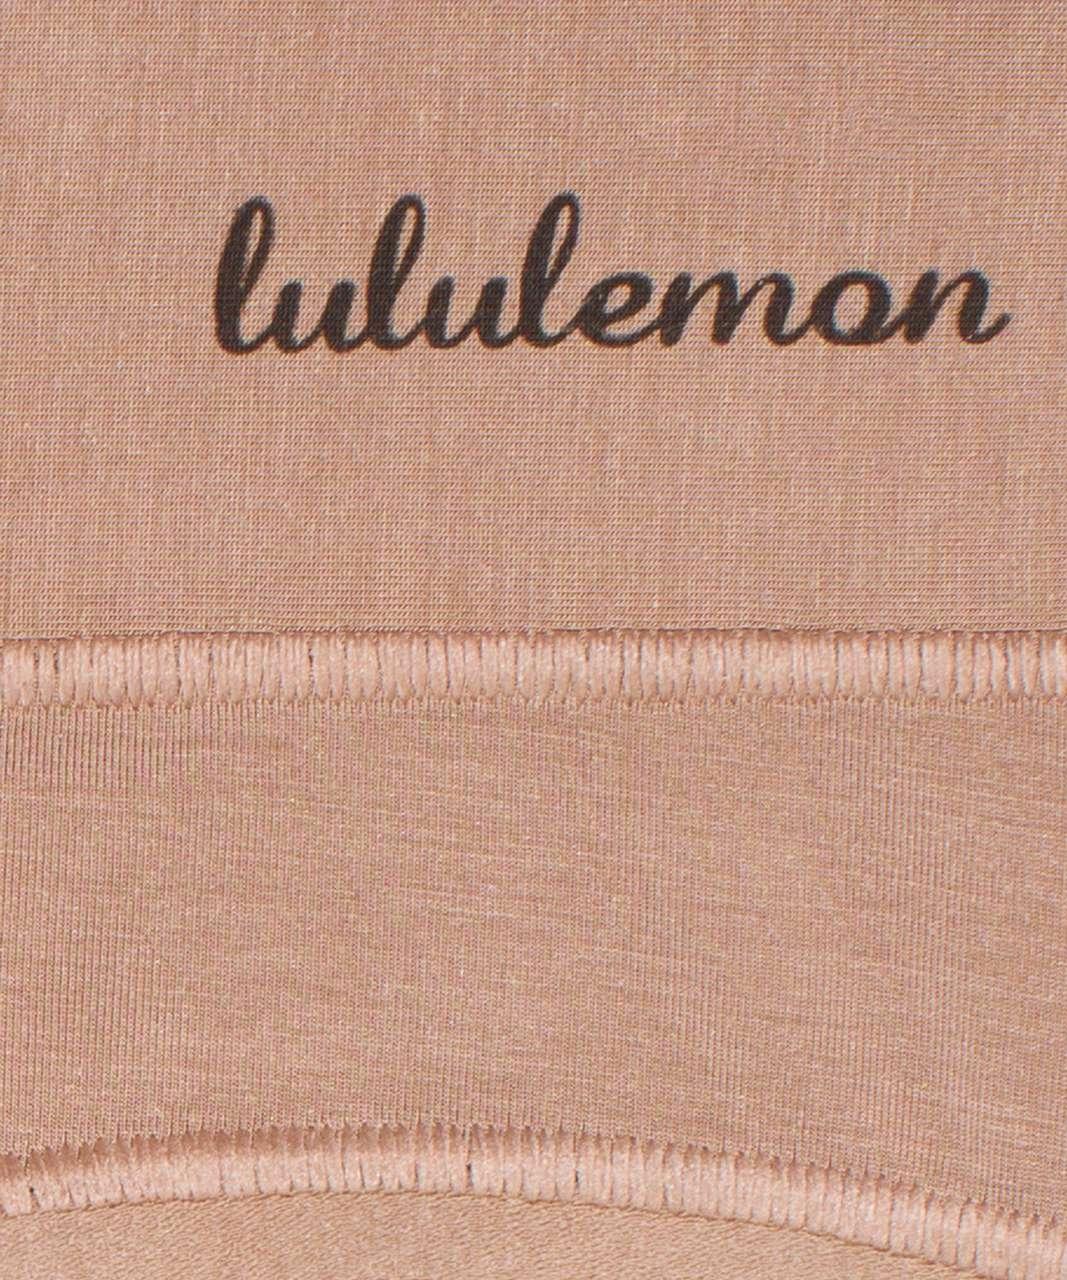 Lululemon Soft Breathable Bikini *5 Pack - Black / Soft Sand / Incognito Camo Multi Grey / Black / Garnet